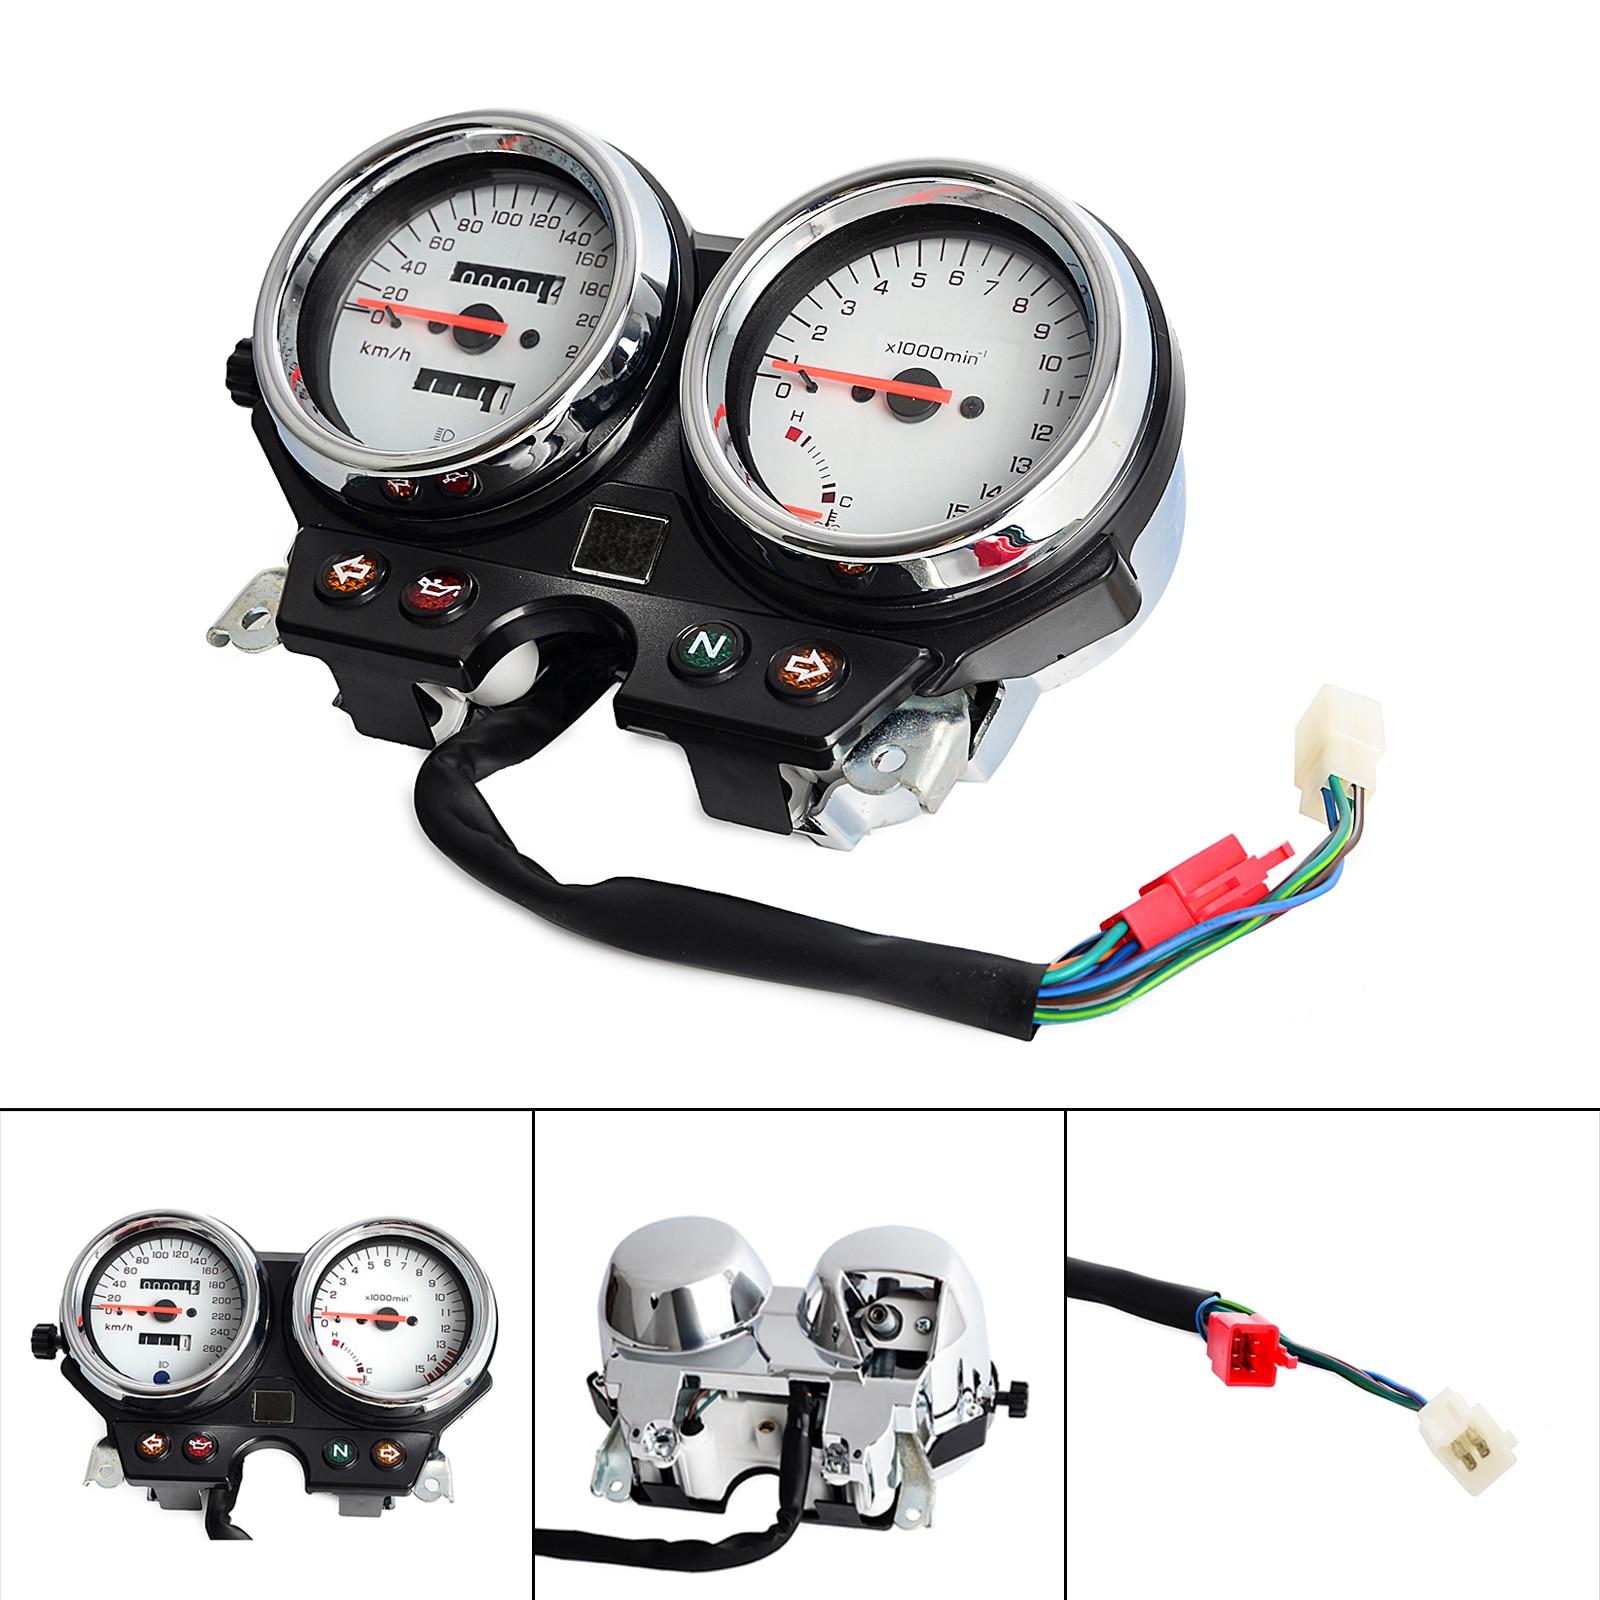 Motorcycle Gauge Cluster Speedometer Dashboard Tachometer For Honda CB600 Hornet 600 1996 1997 1998 1999 2000